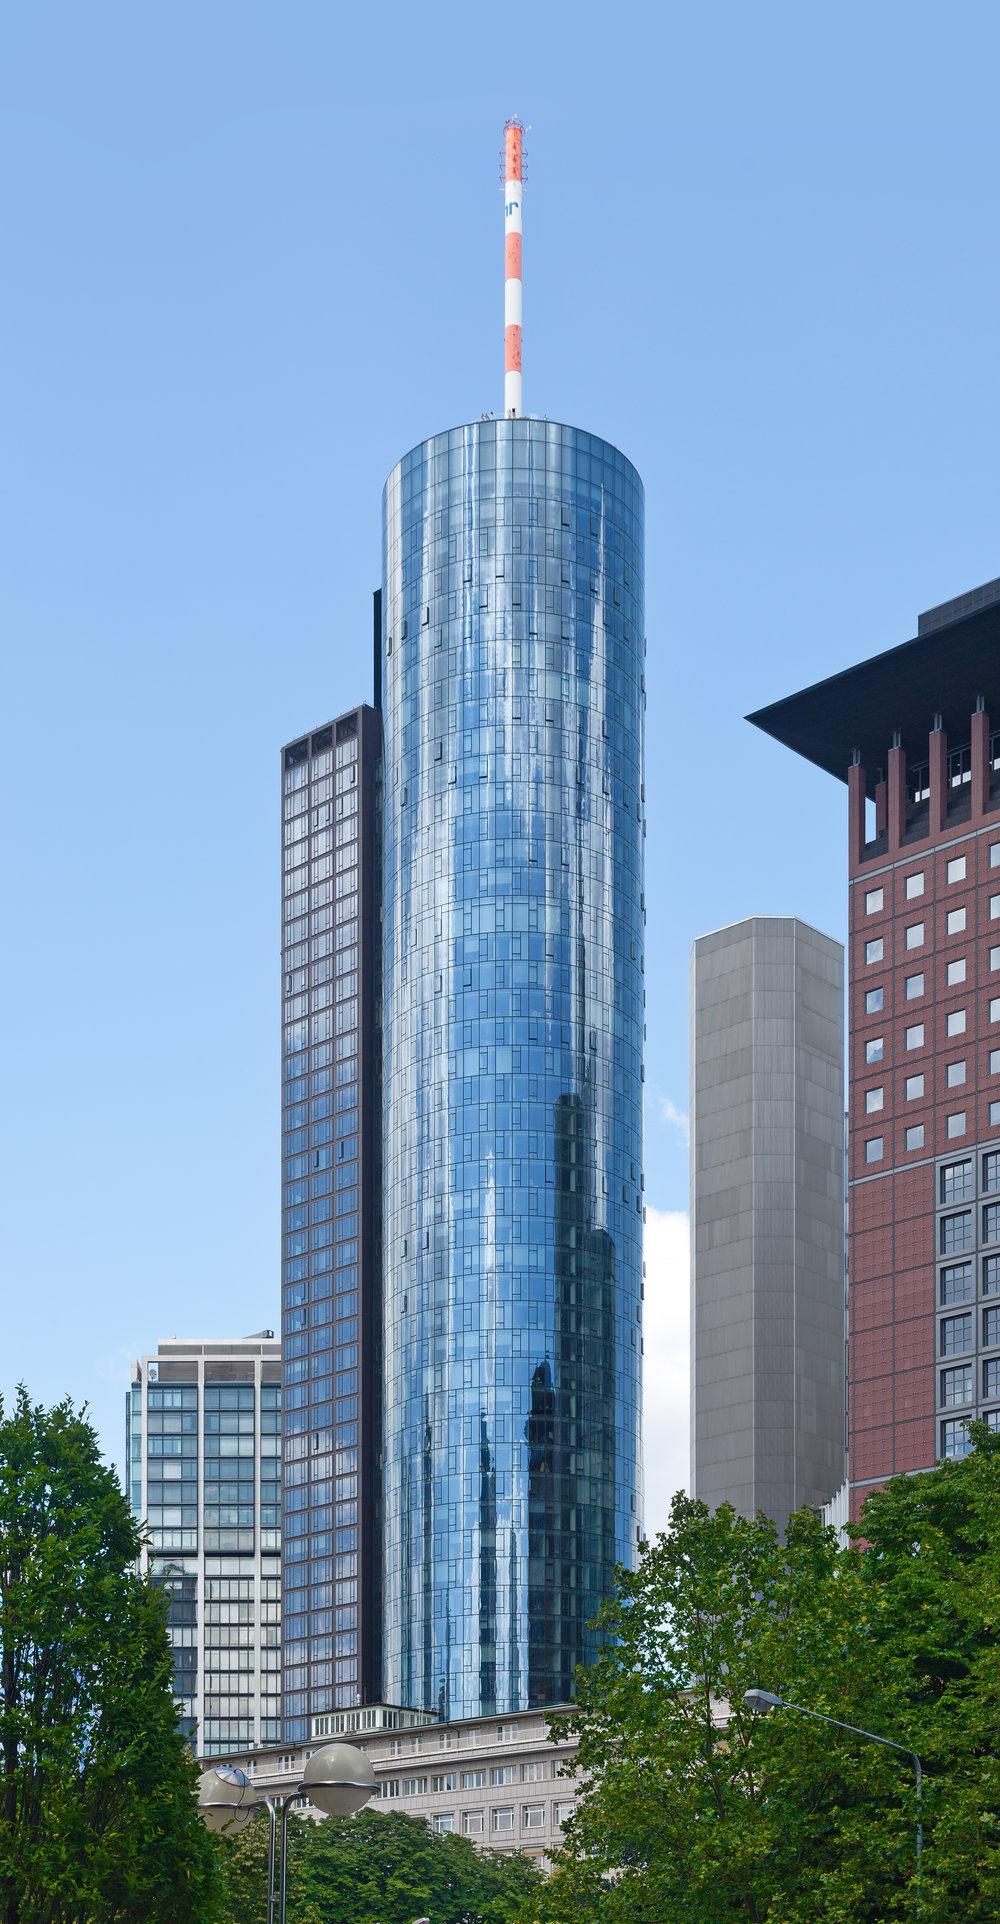 Maintower - Torre de Melo